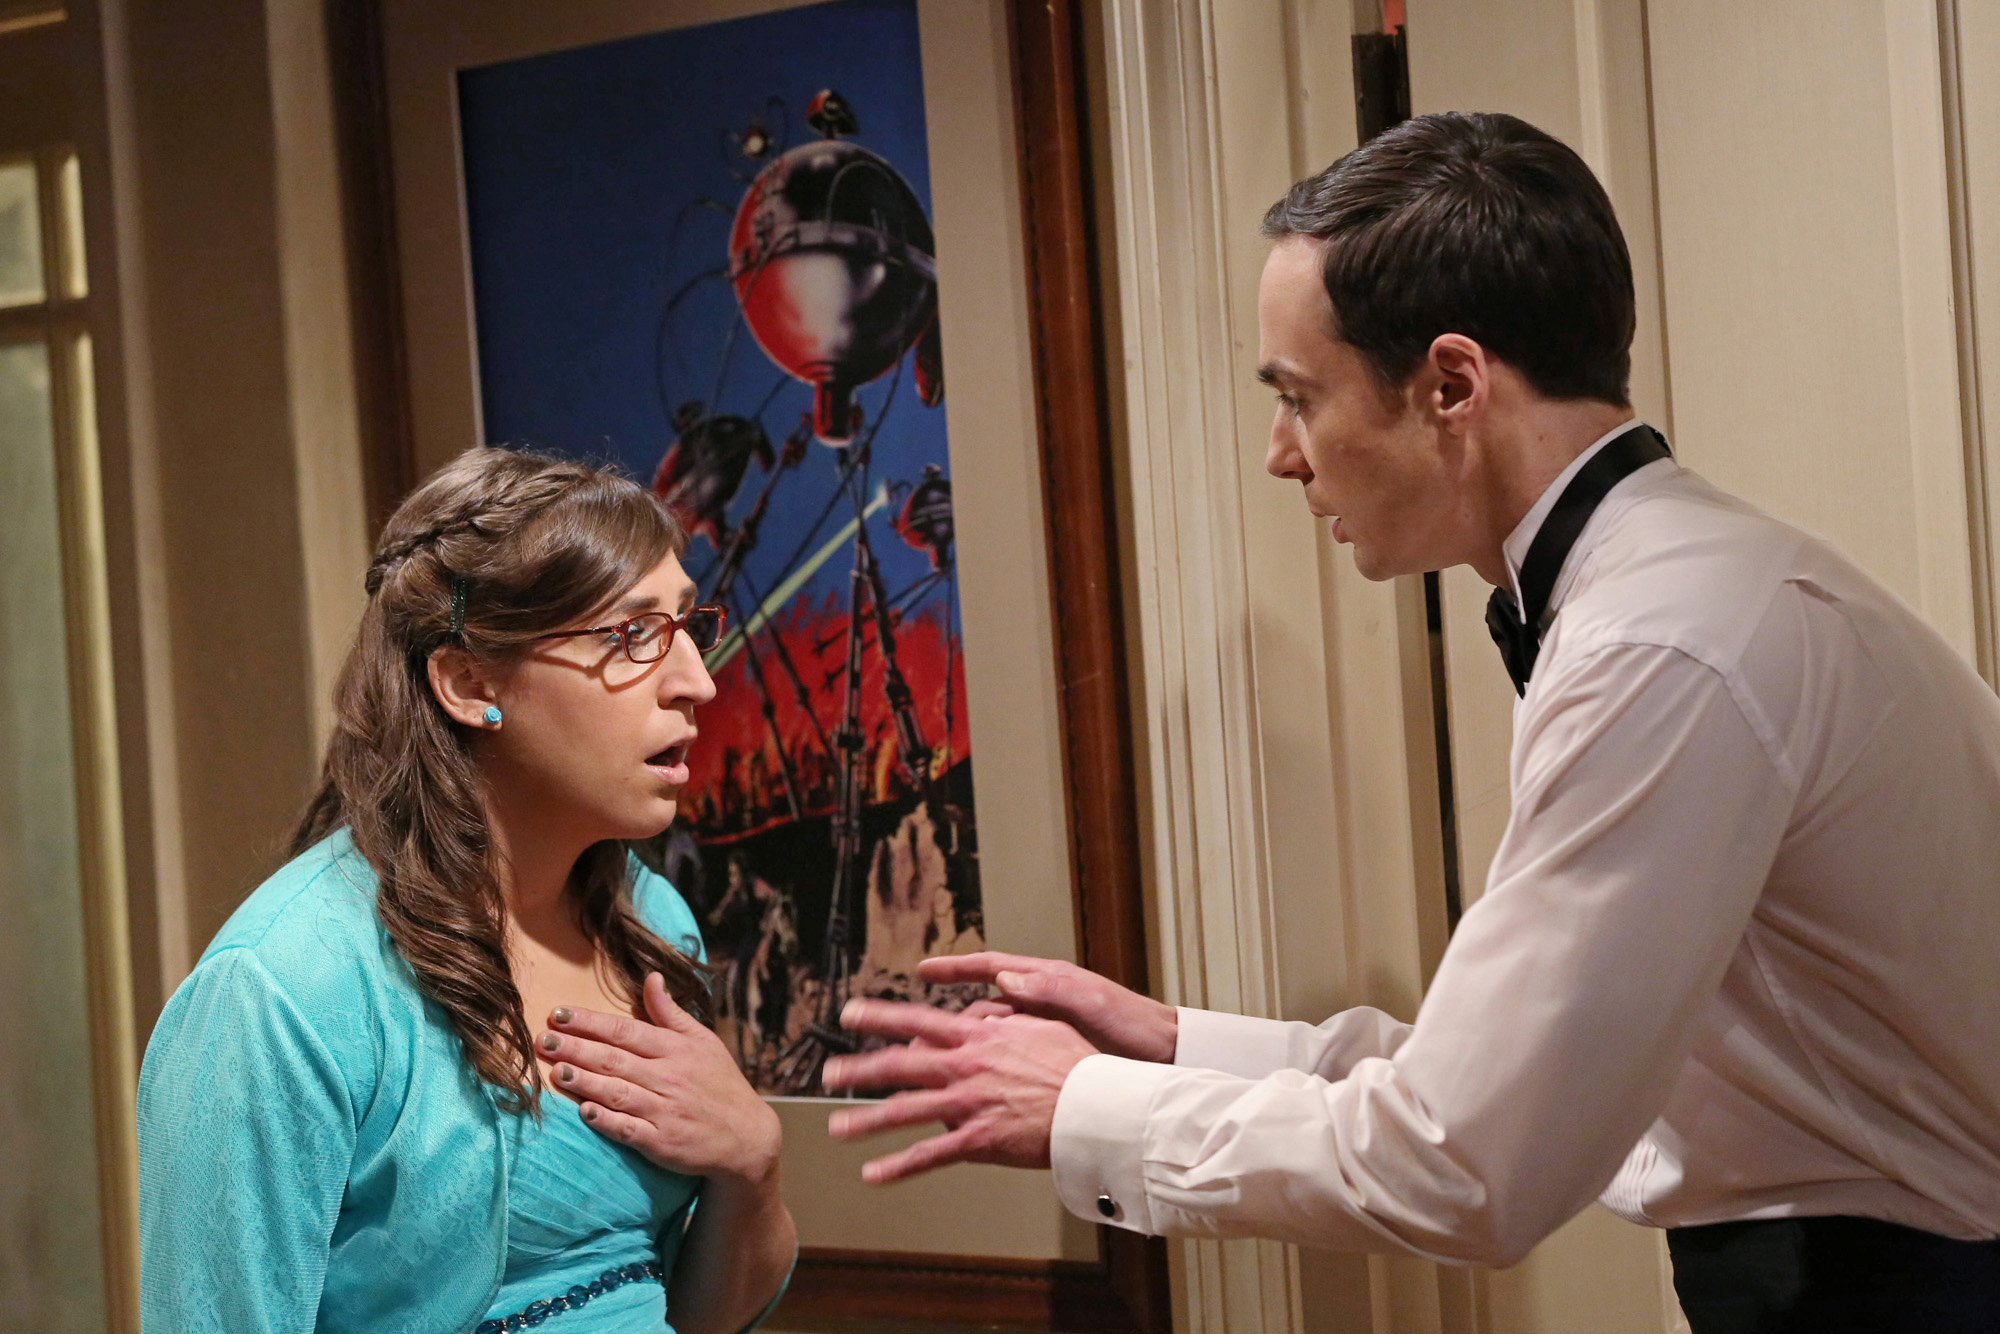 Nice - Sheldon Cooper from The Big Bang Theory